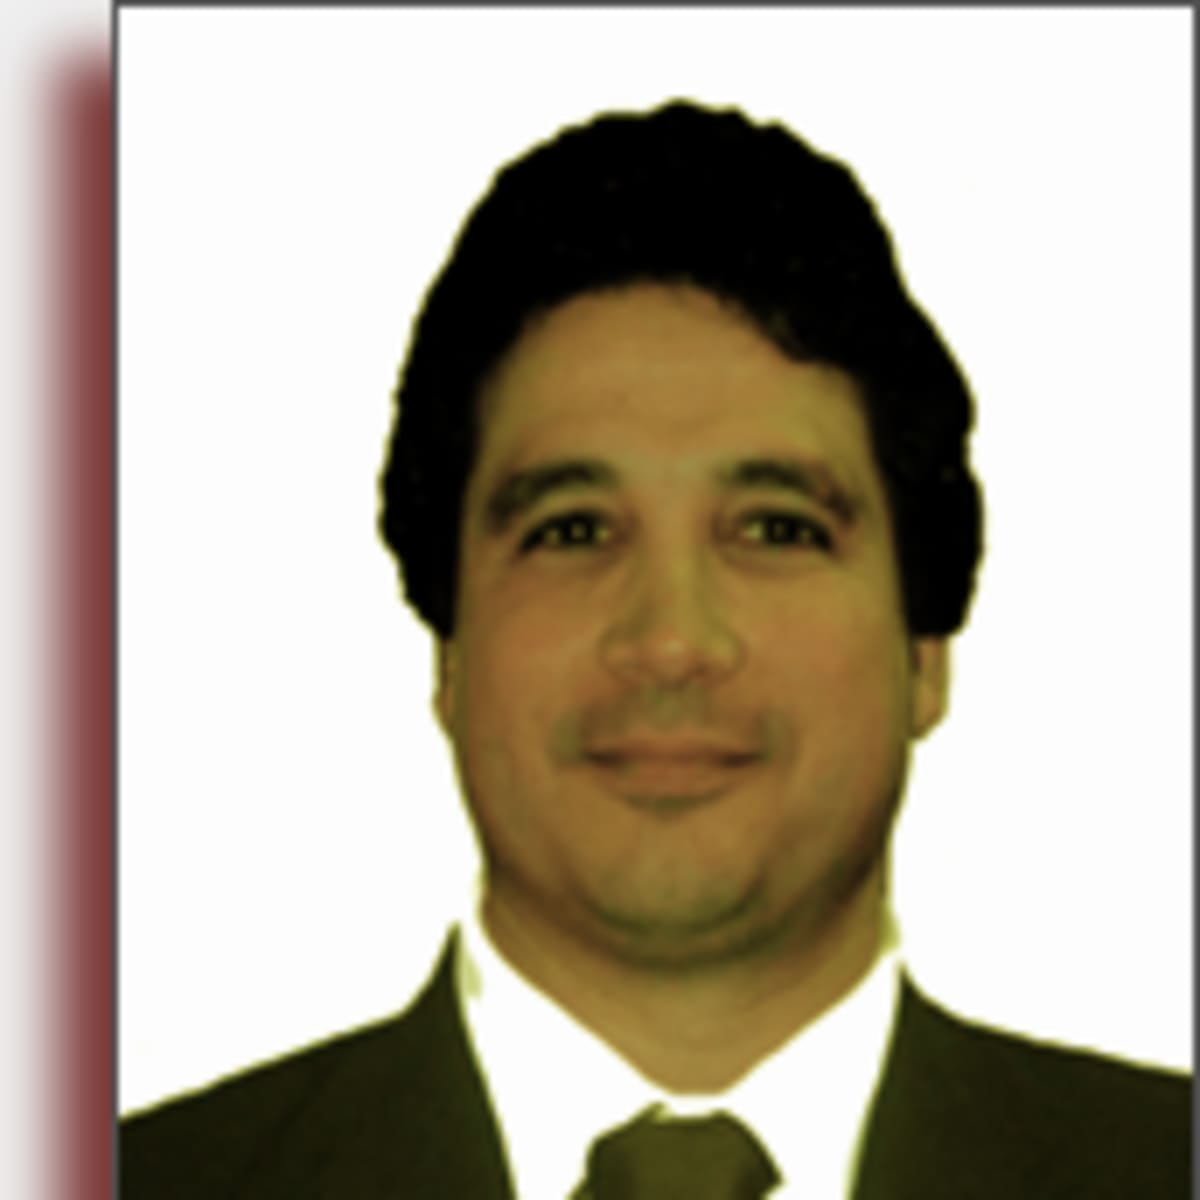 Video Dr Joseph Licata Jr Md Ramsey Nj Surgeon